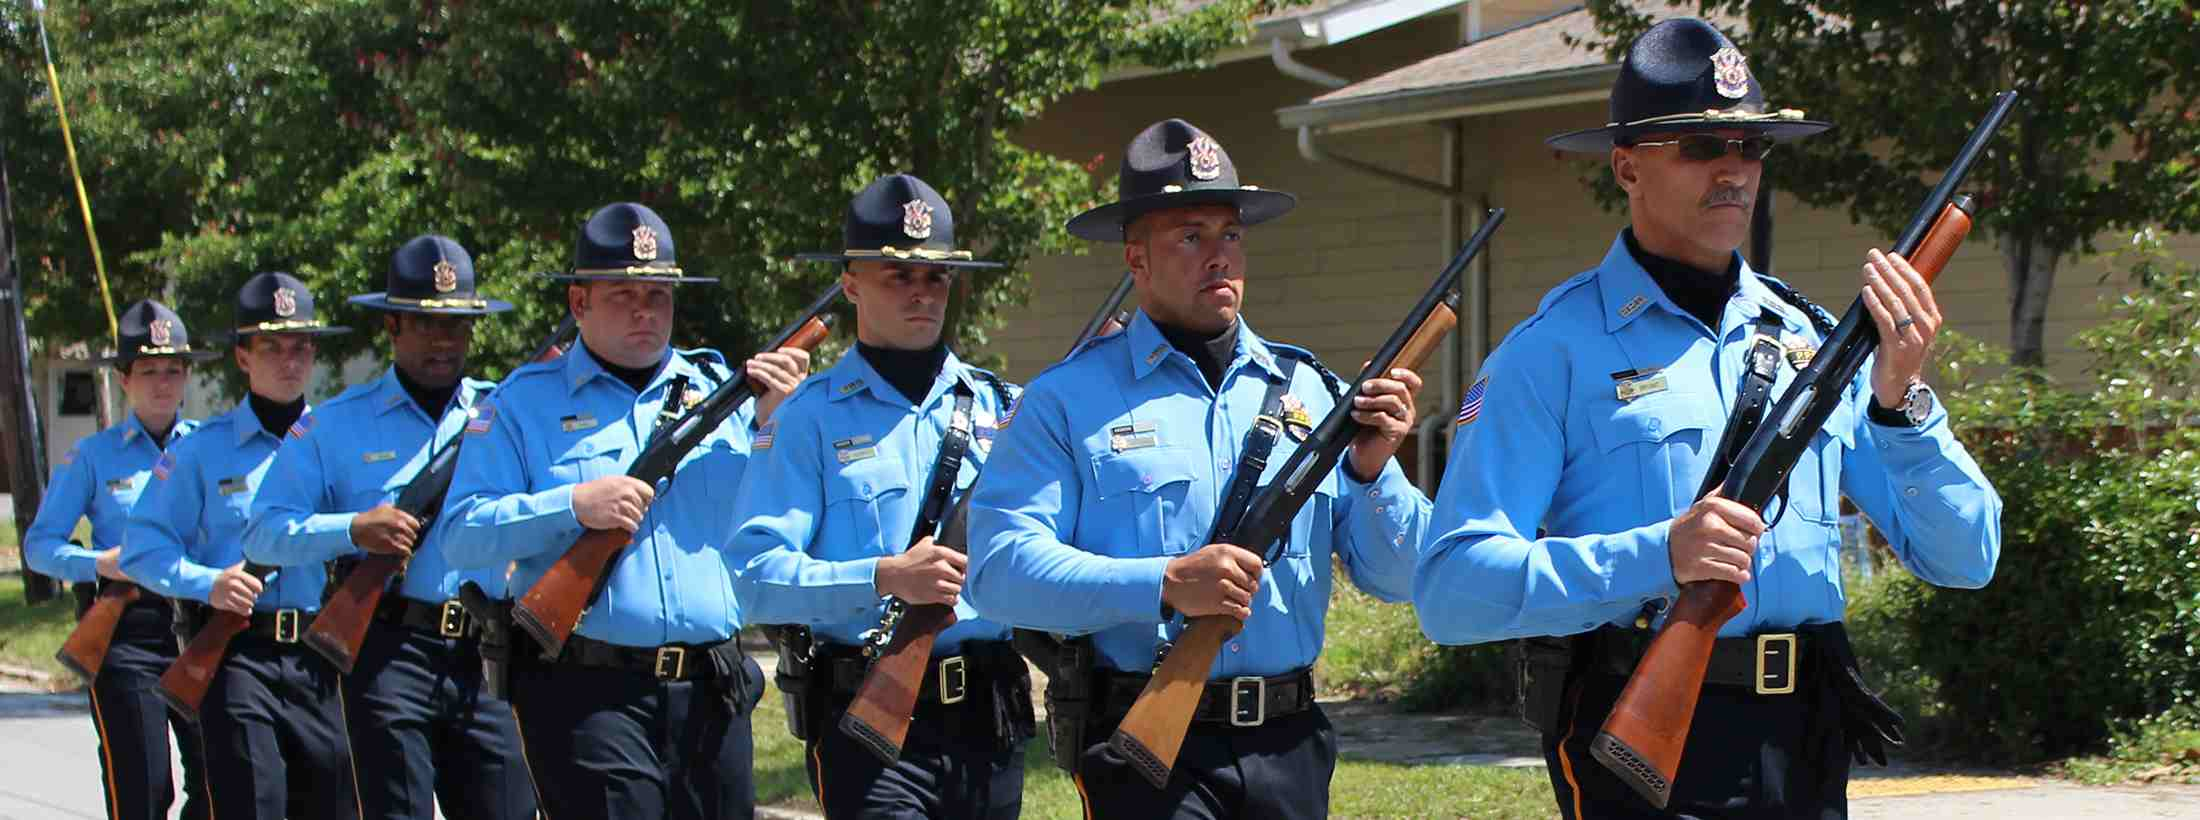 Pensacola Police Department | City of Pensacola | City of